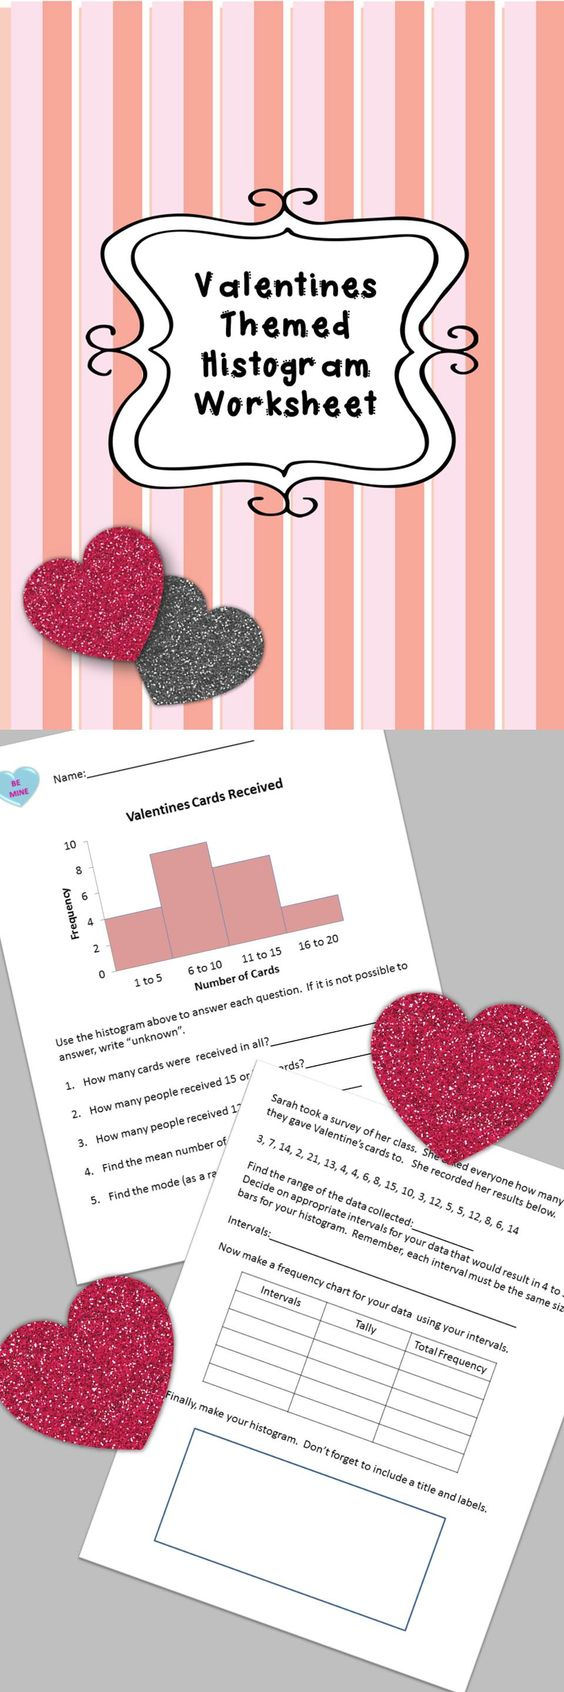 Histogram Worksheet 6Th Grade – Histogram Worksheets